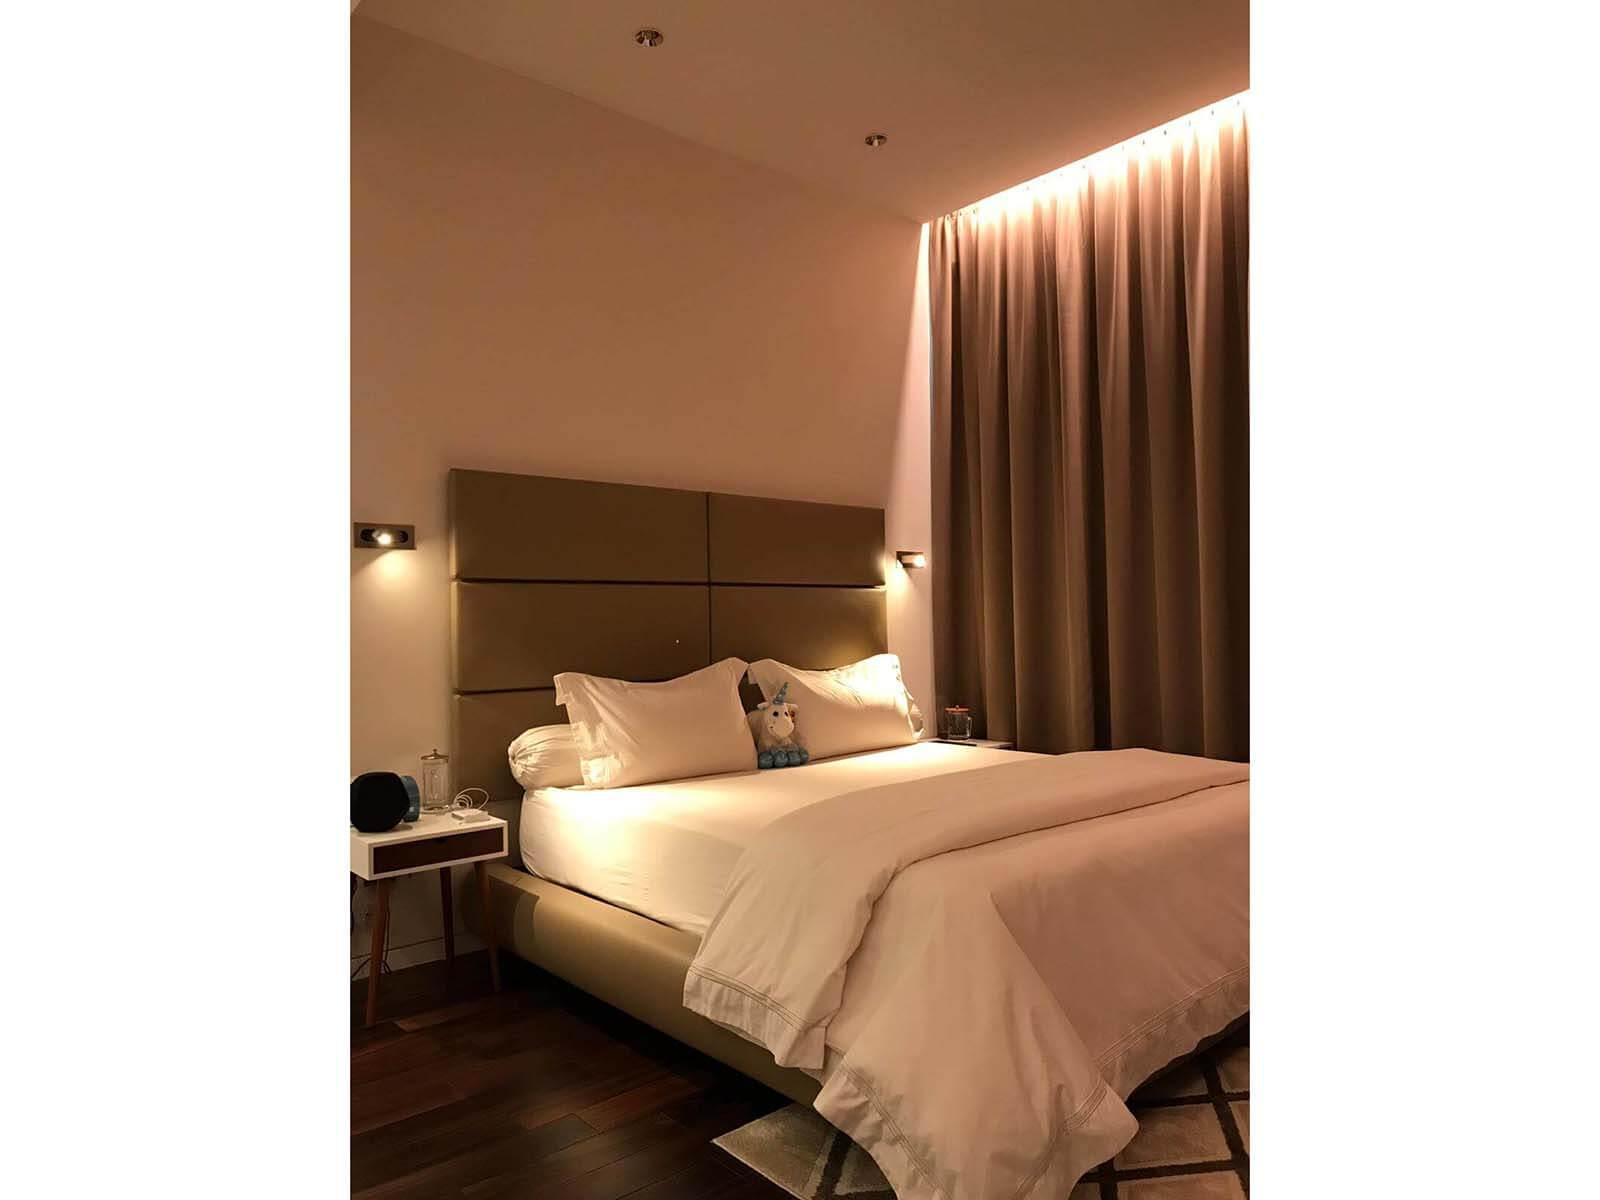 7A Swettenham ham Residential bedroom lighting project